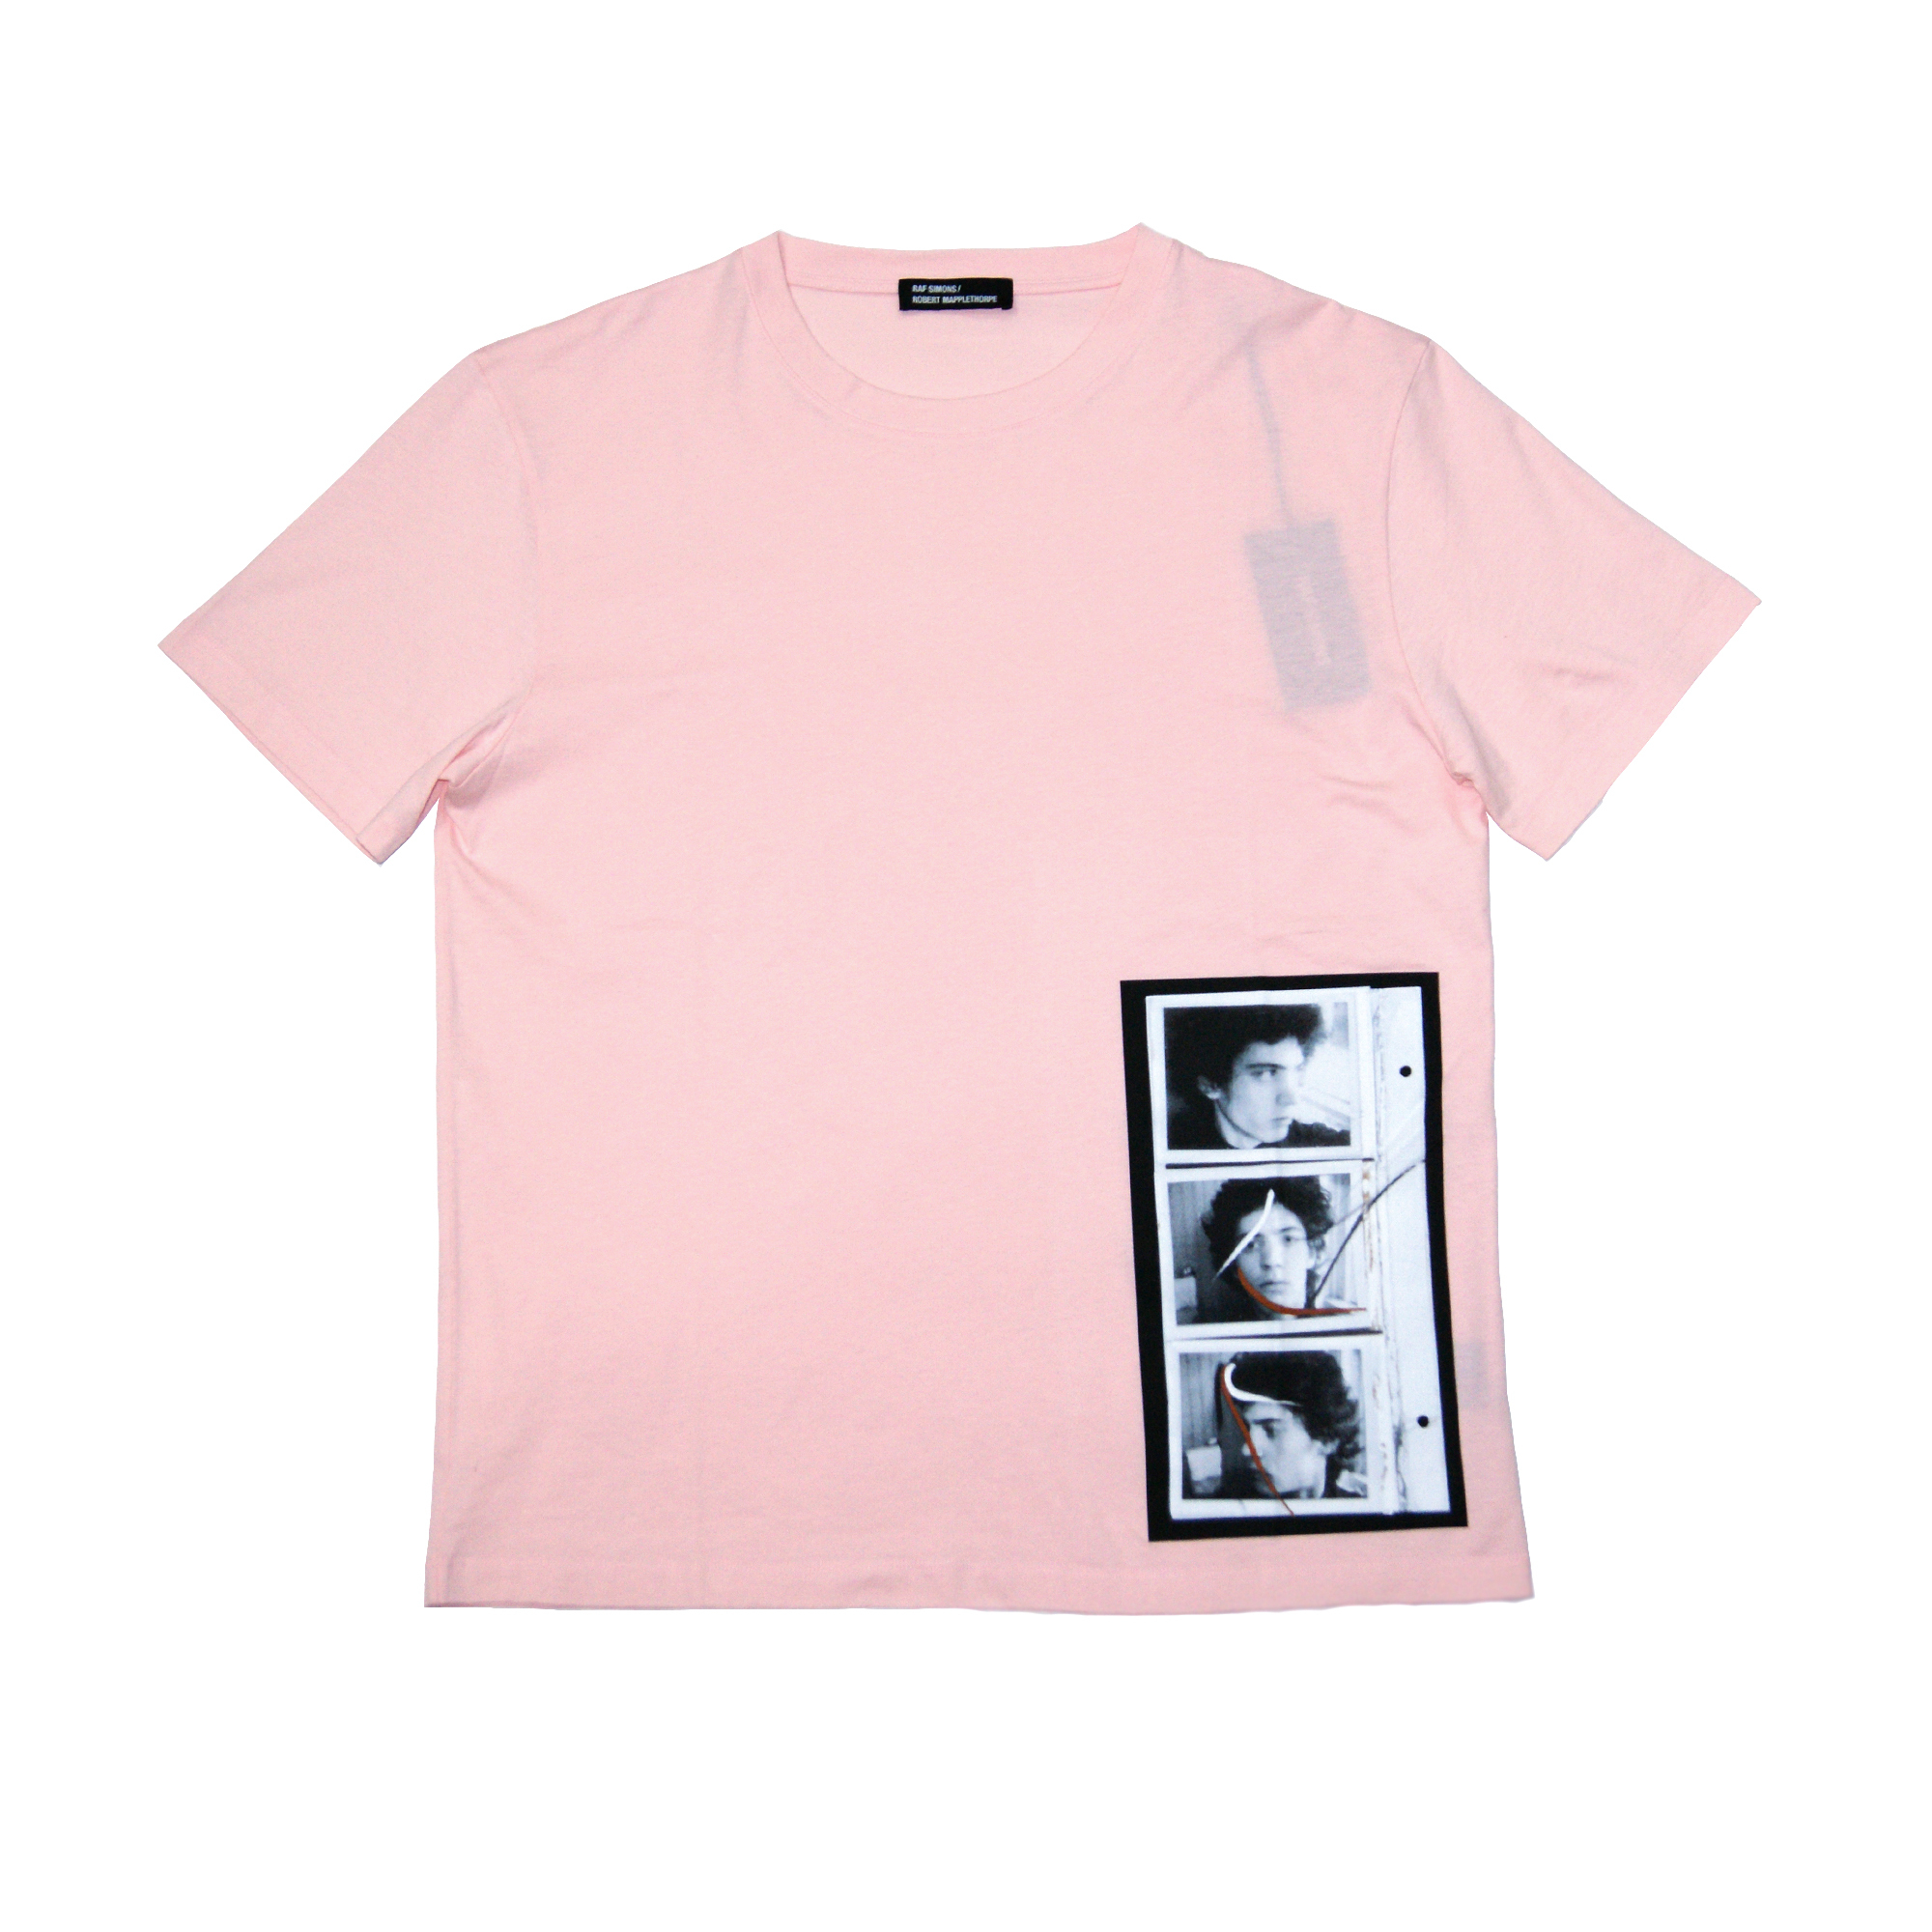 Raf simons robert mapplethorpe t shirts pink clo z for Raf simons robert mapplethorpe shirt